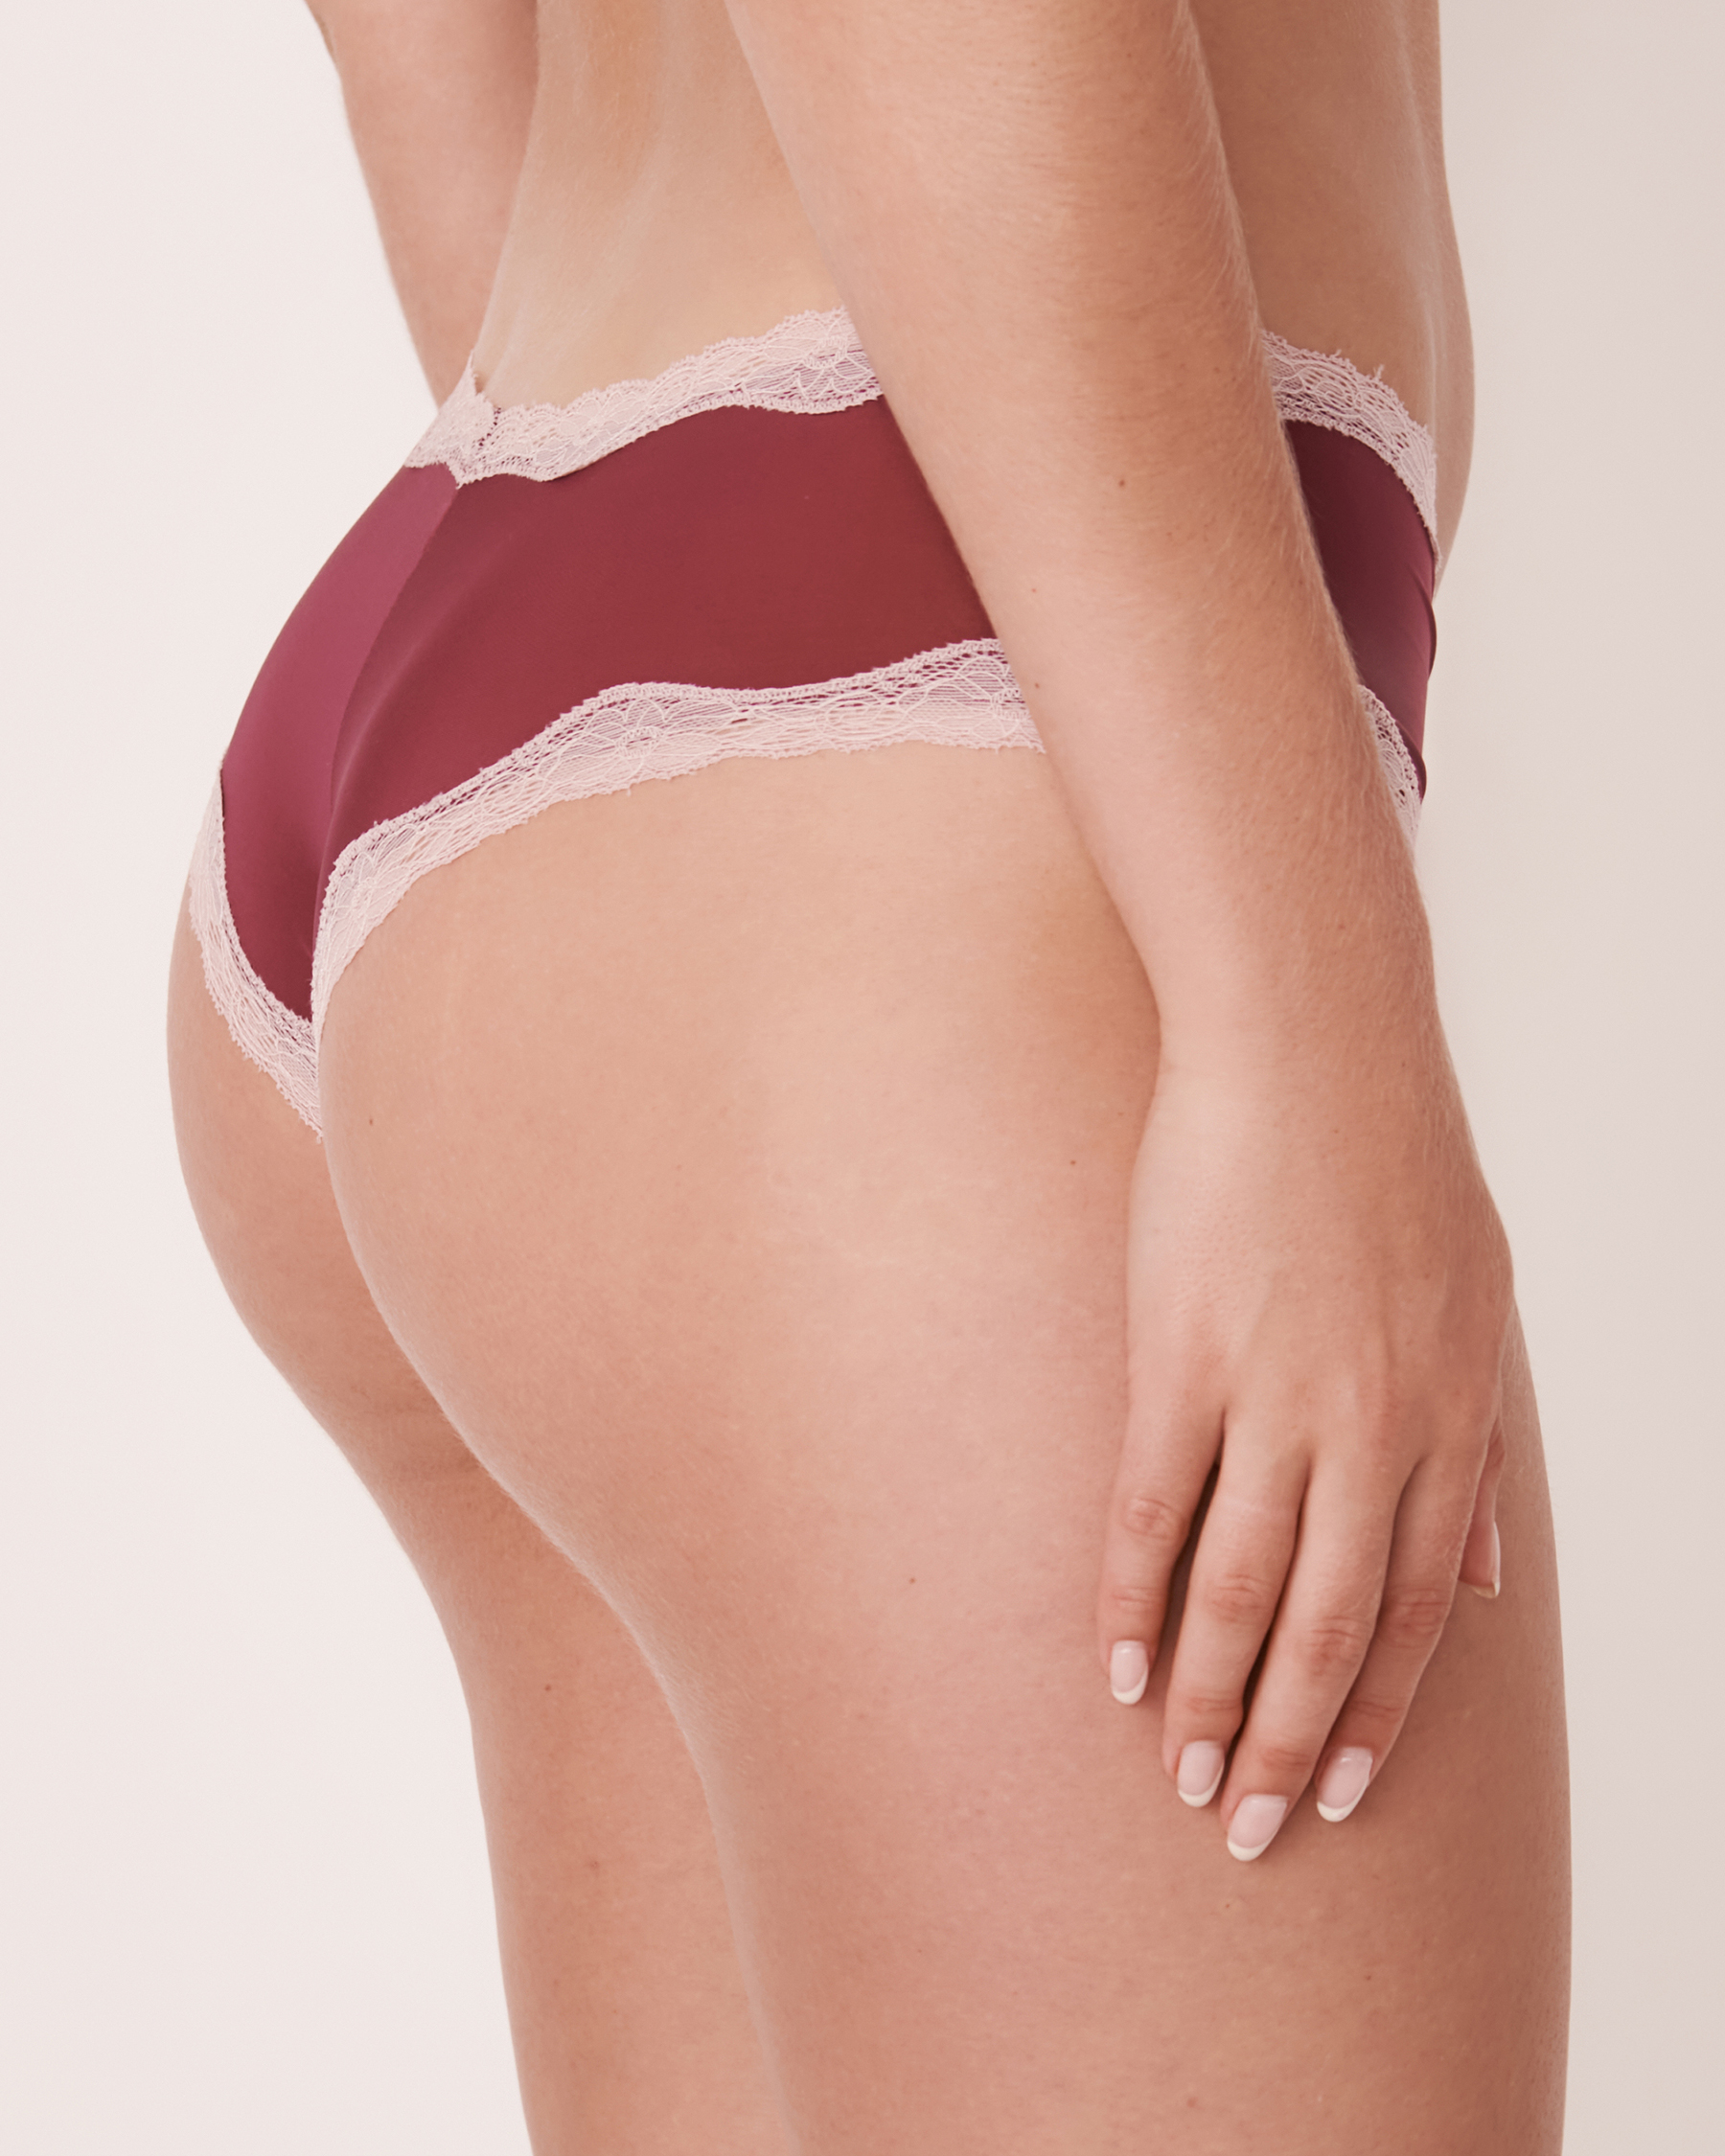 LA VIE EN ROSE Cheeky Panty Prune 20200075 - View2